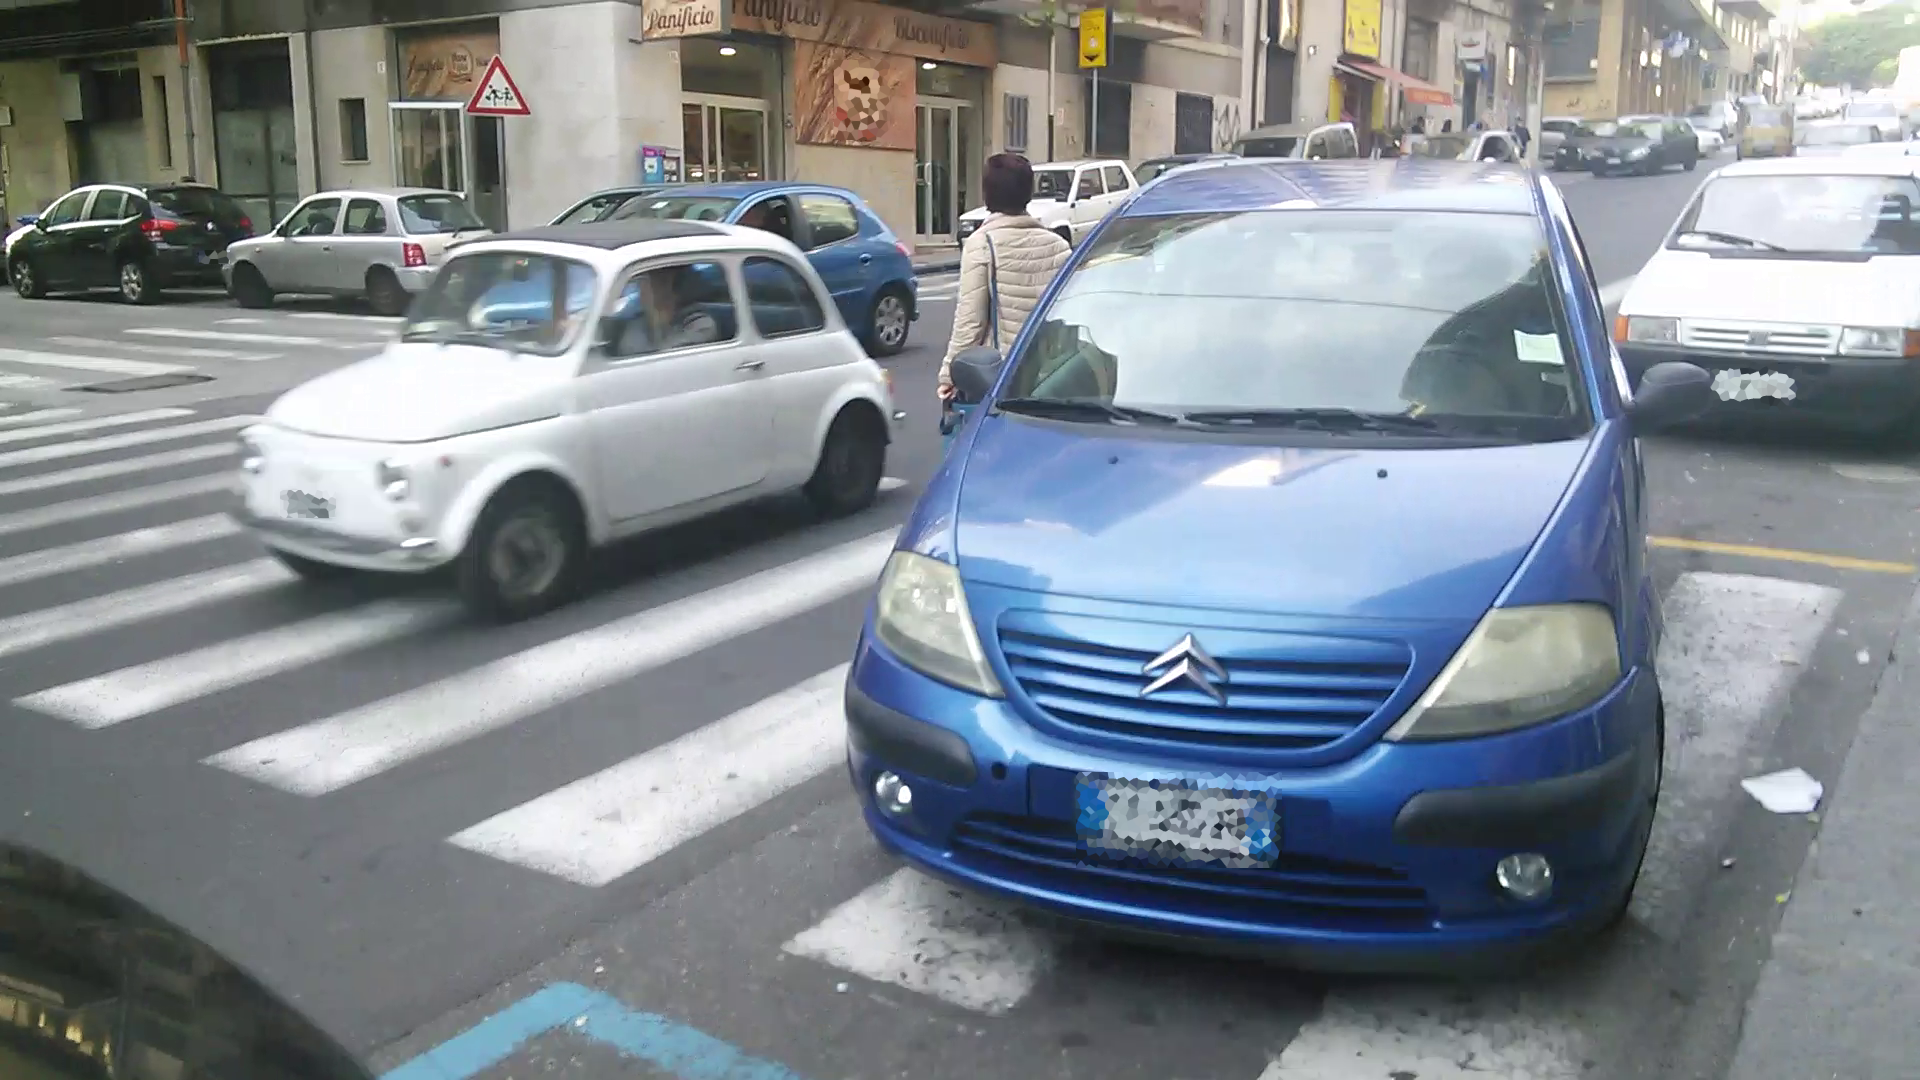 04_parcheggio_strisce_n3_(via Passo Gravina)